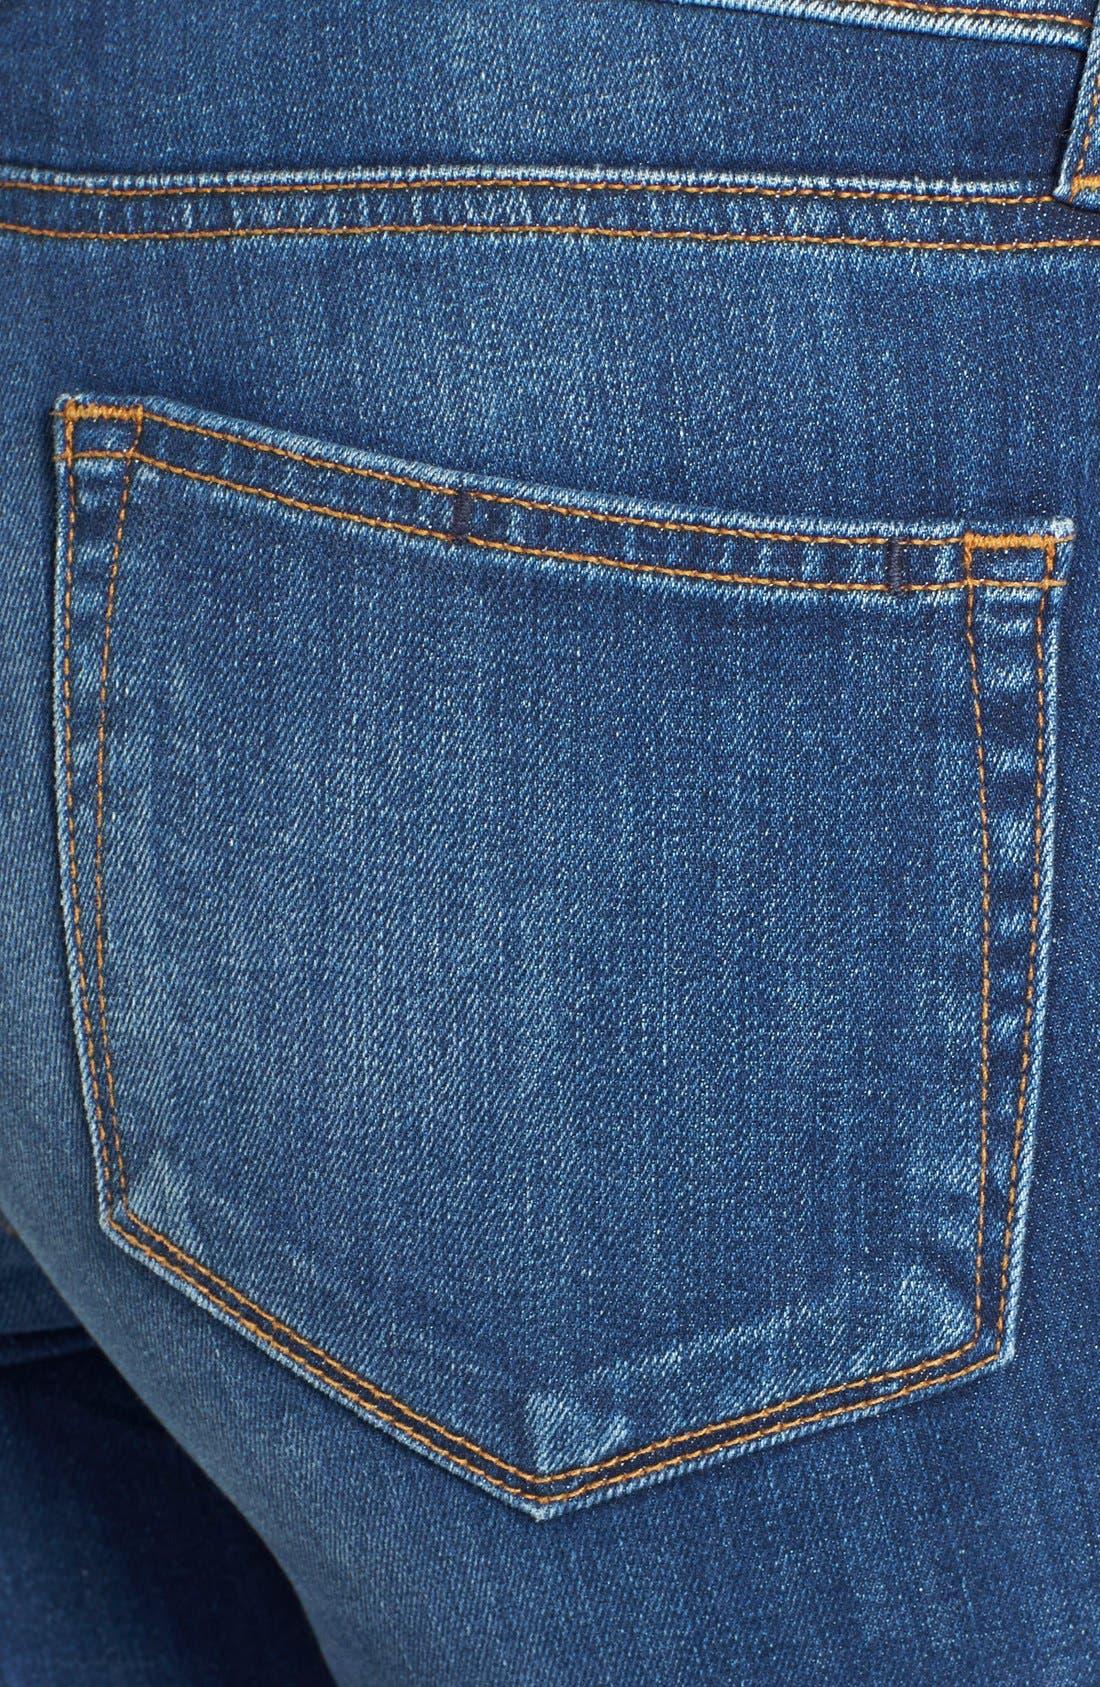 Alternate Image 3  - Paige Denim 'Hoxton' Ultra Skinny Jeans (Constance)